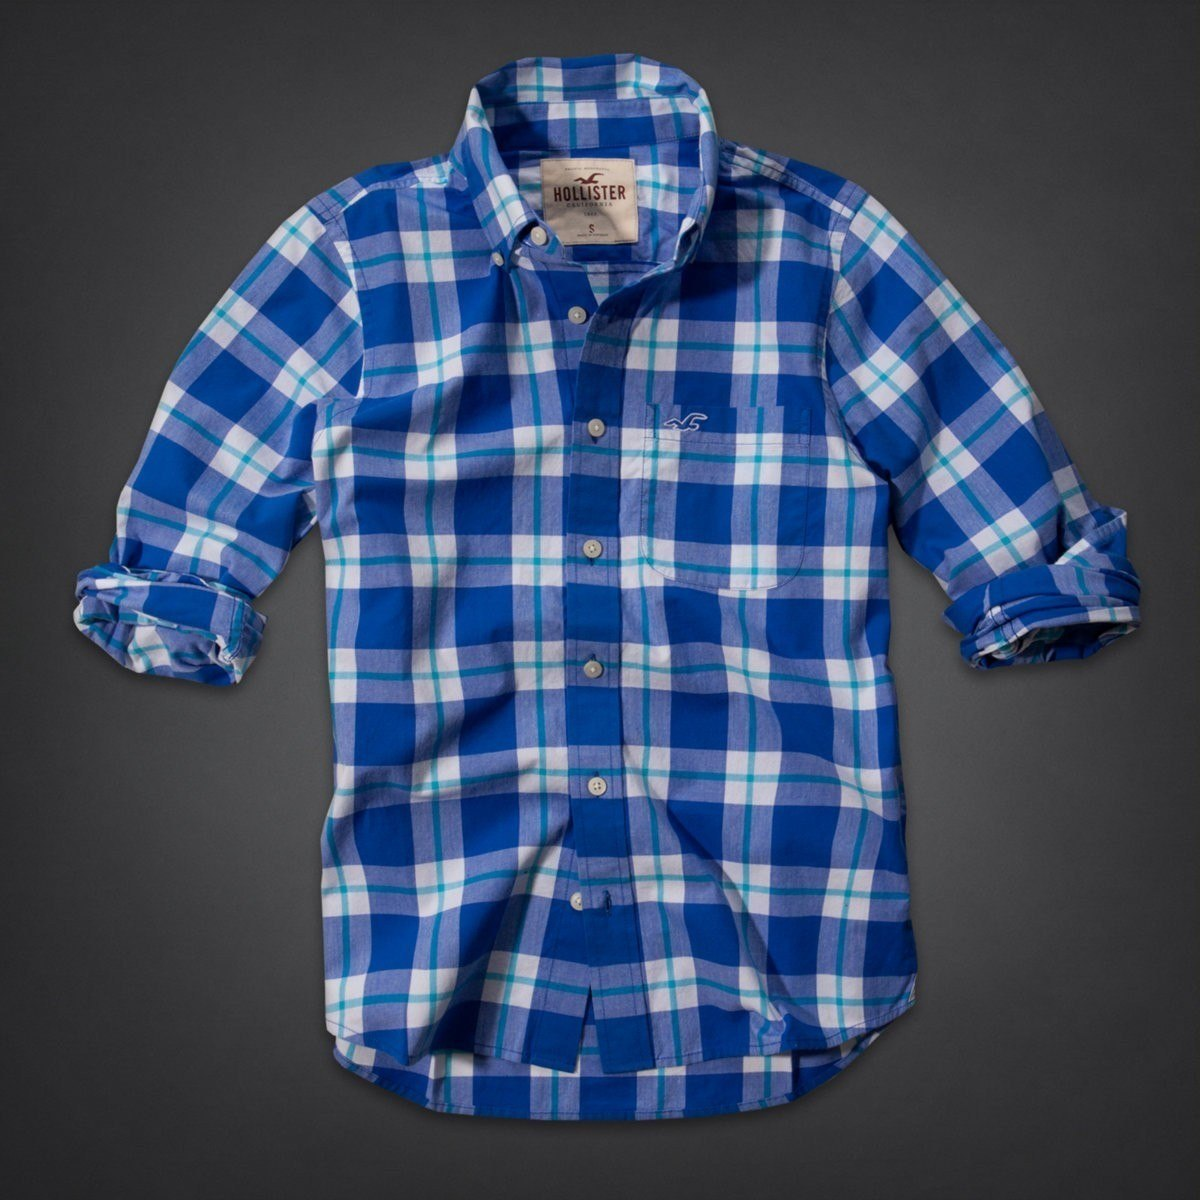 Abercrombie Camisas Hombre